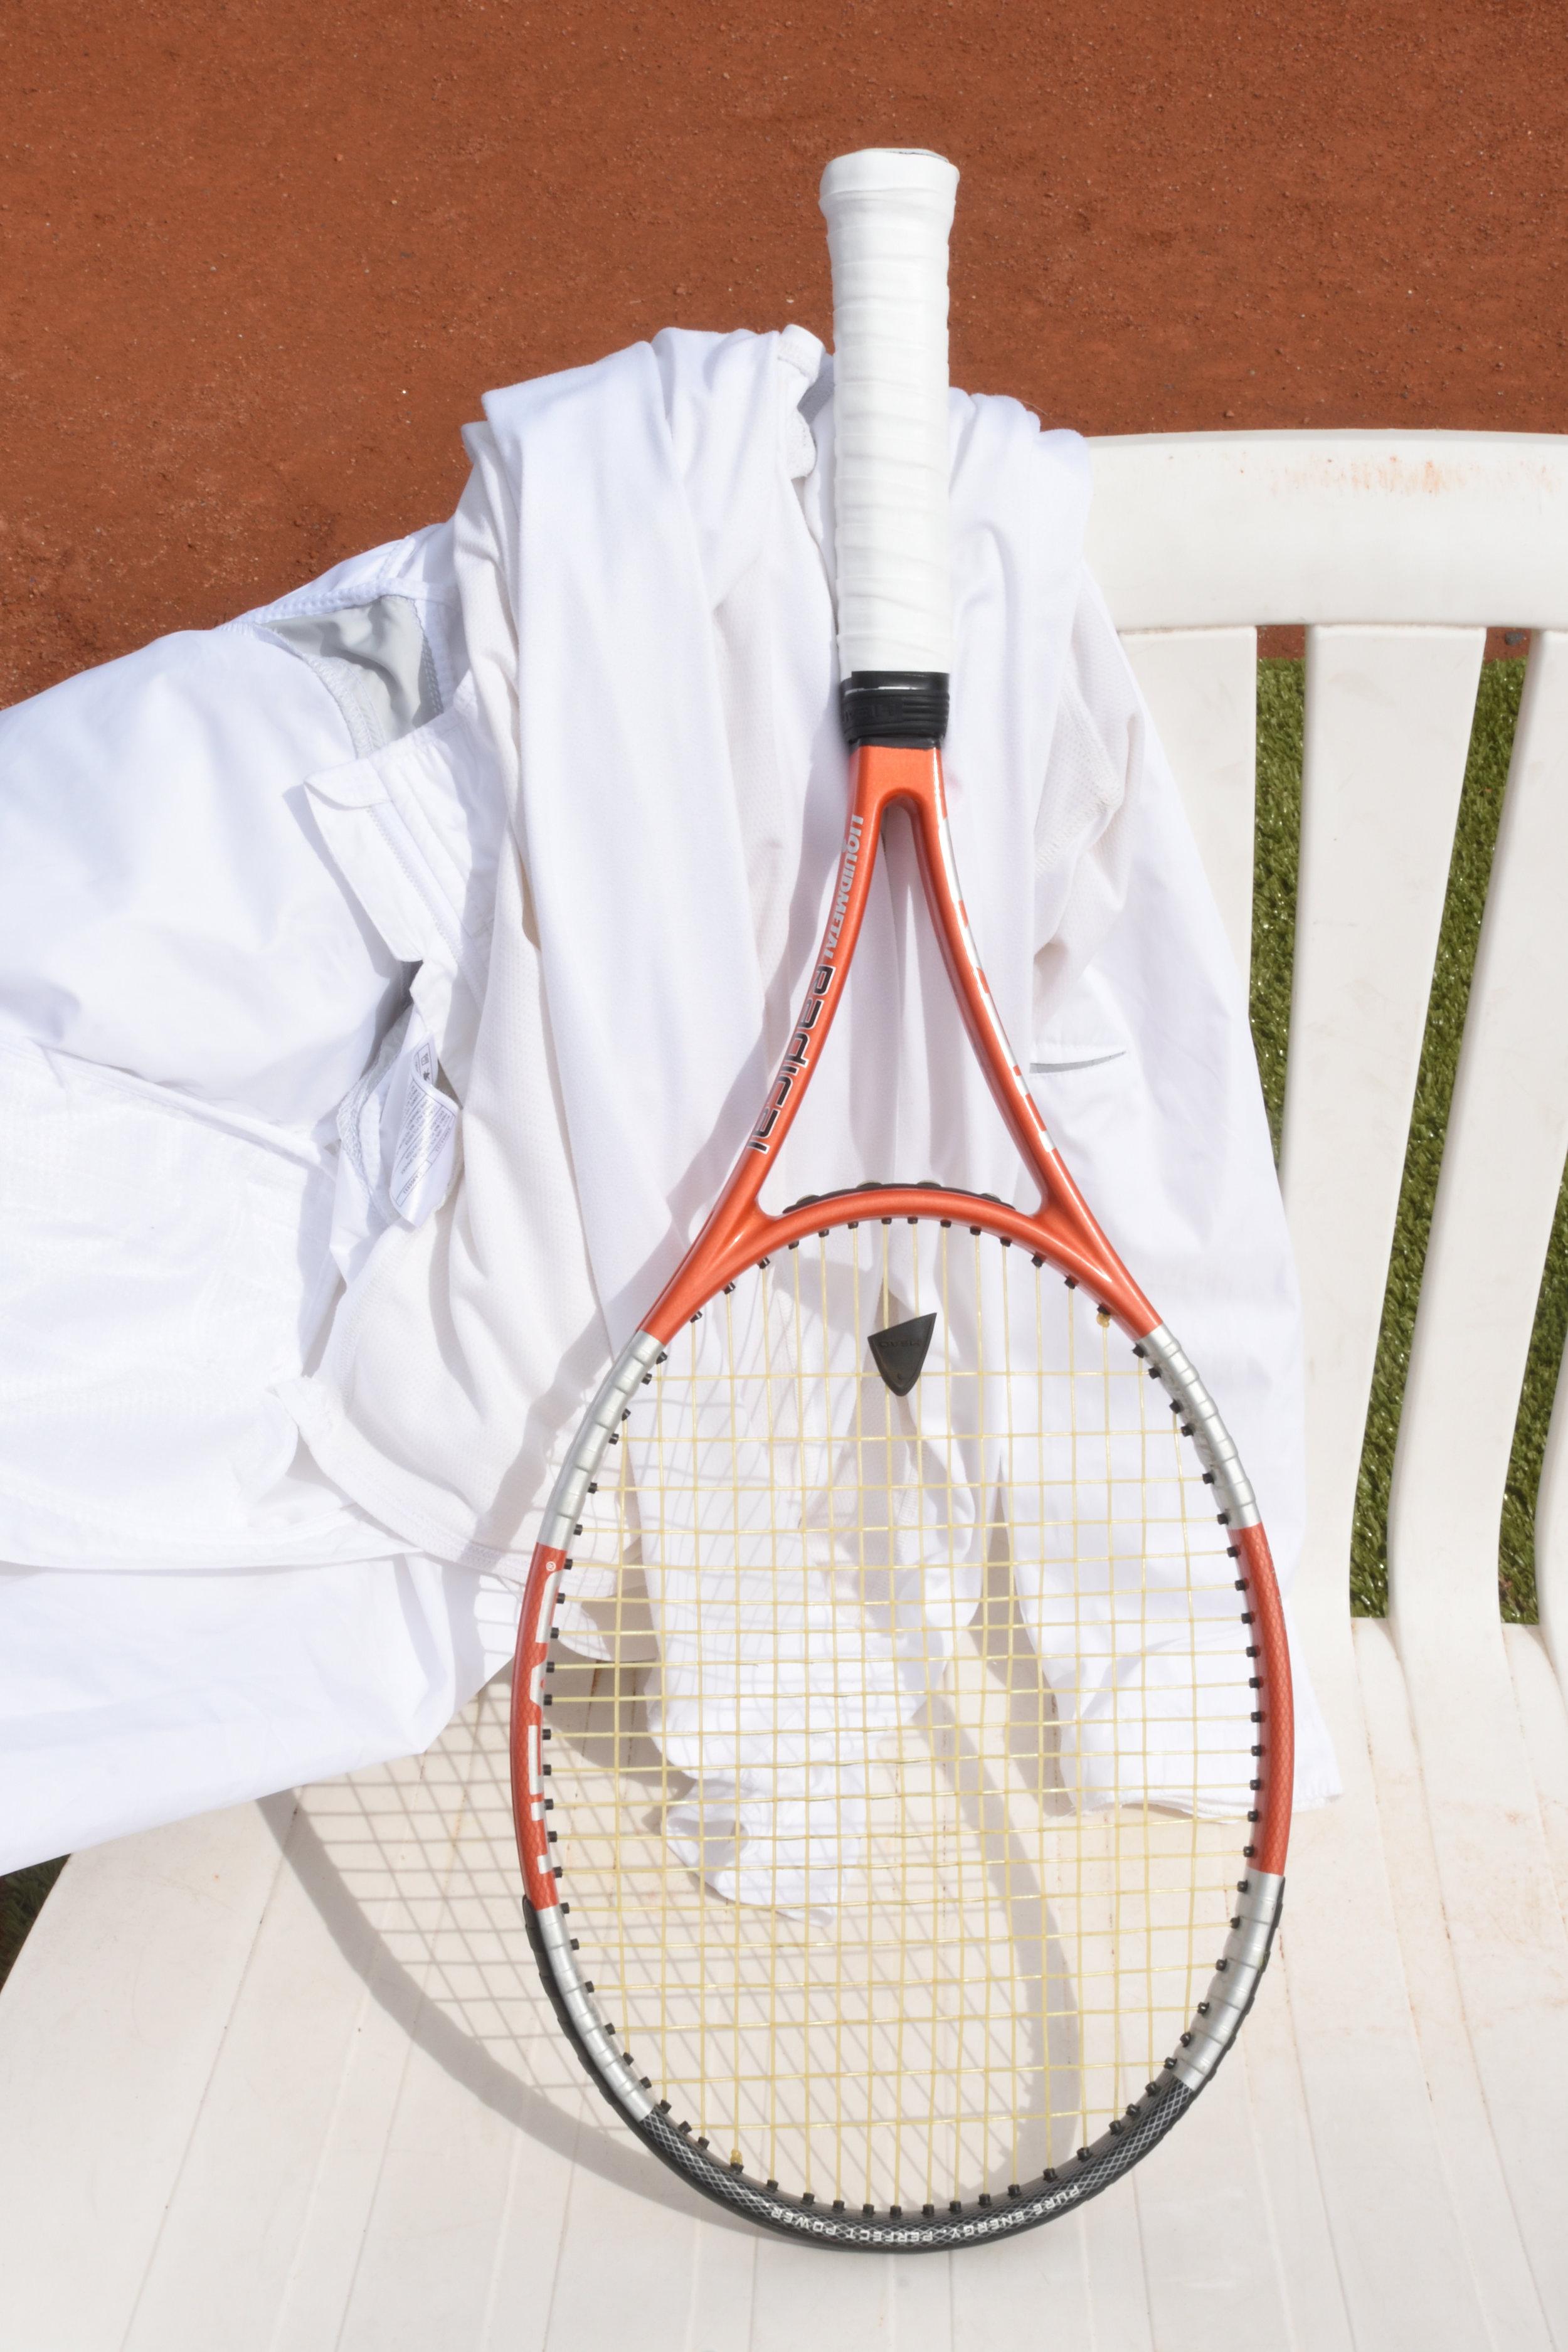 Proffs tennis spelare dating